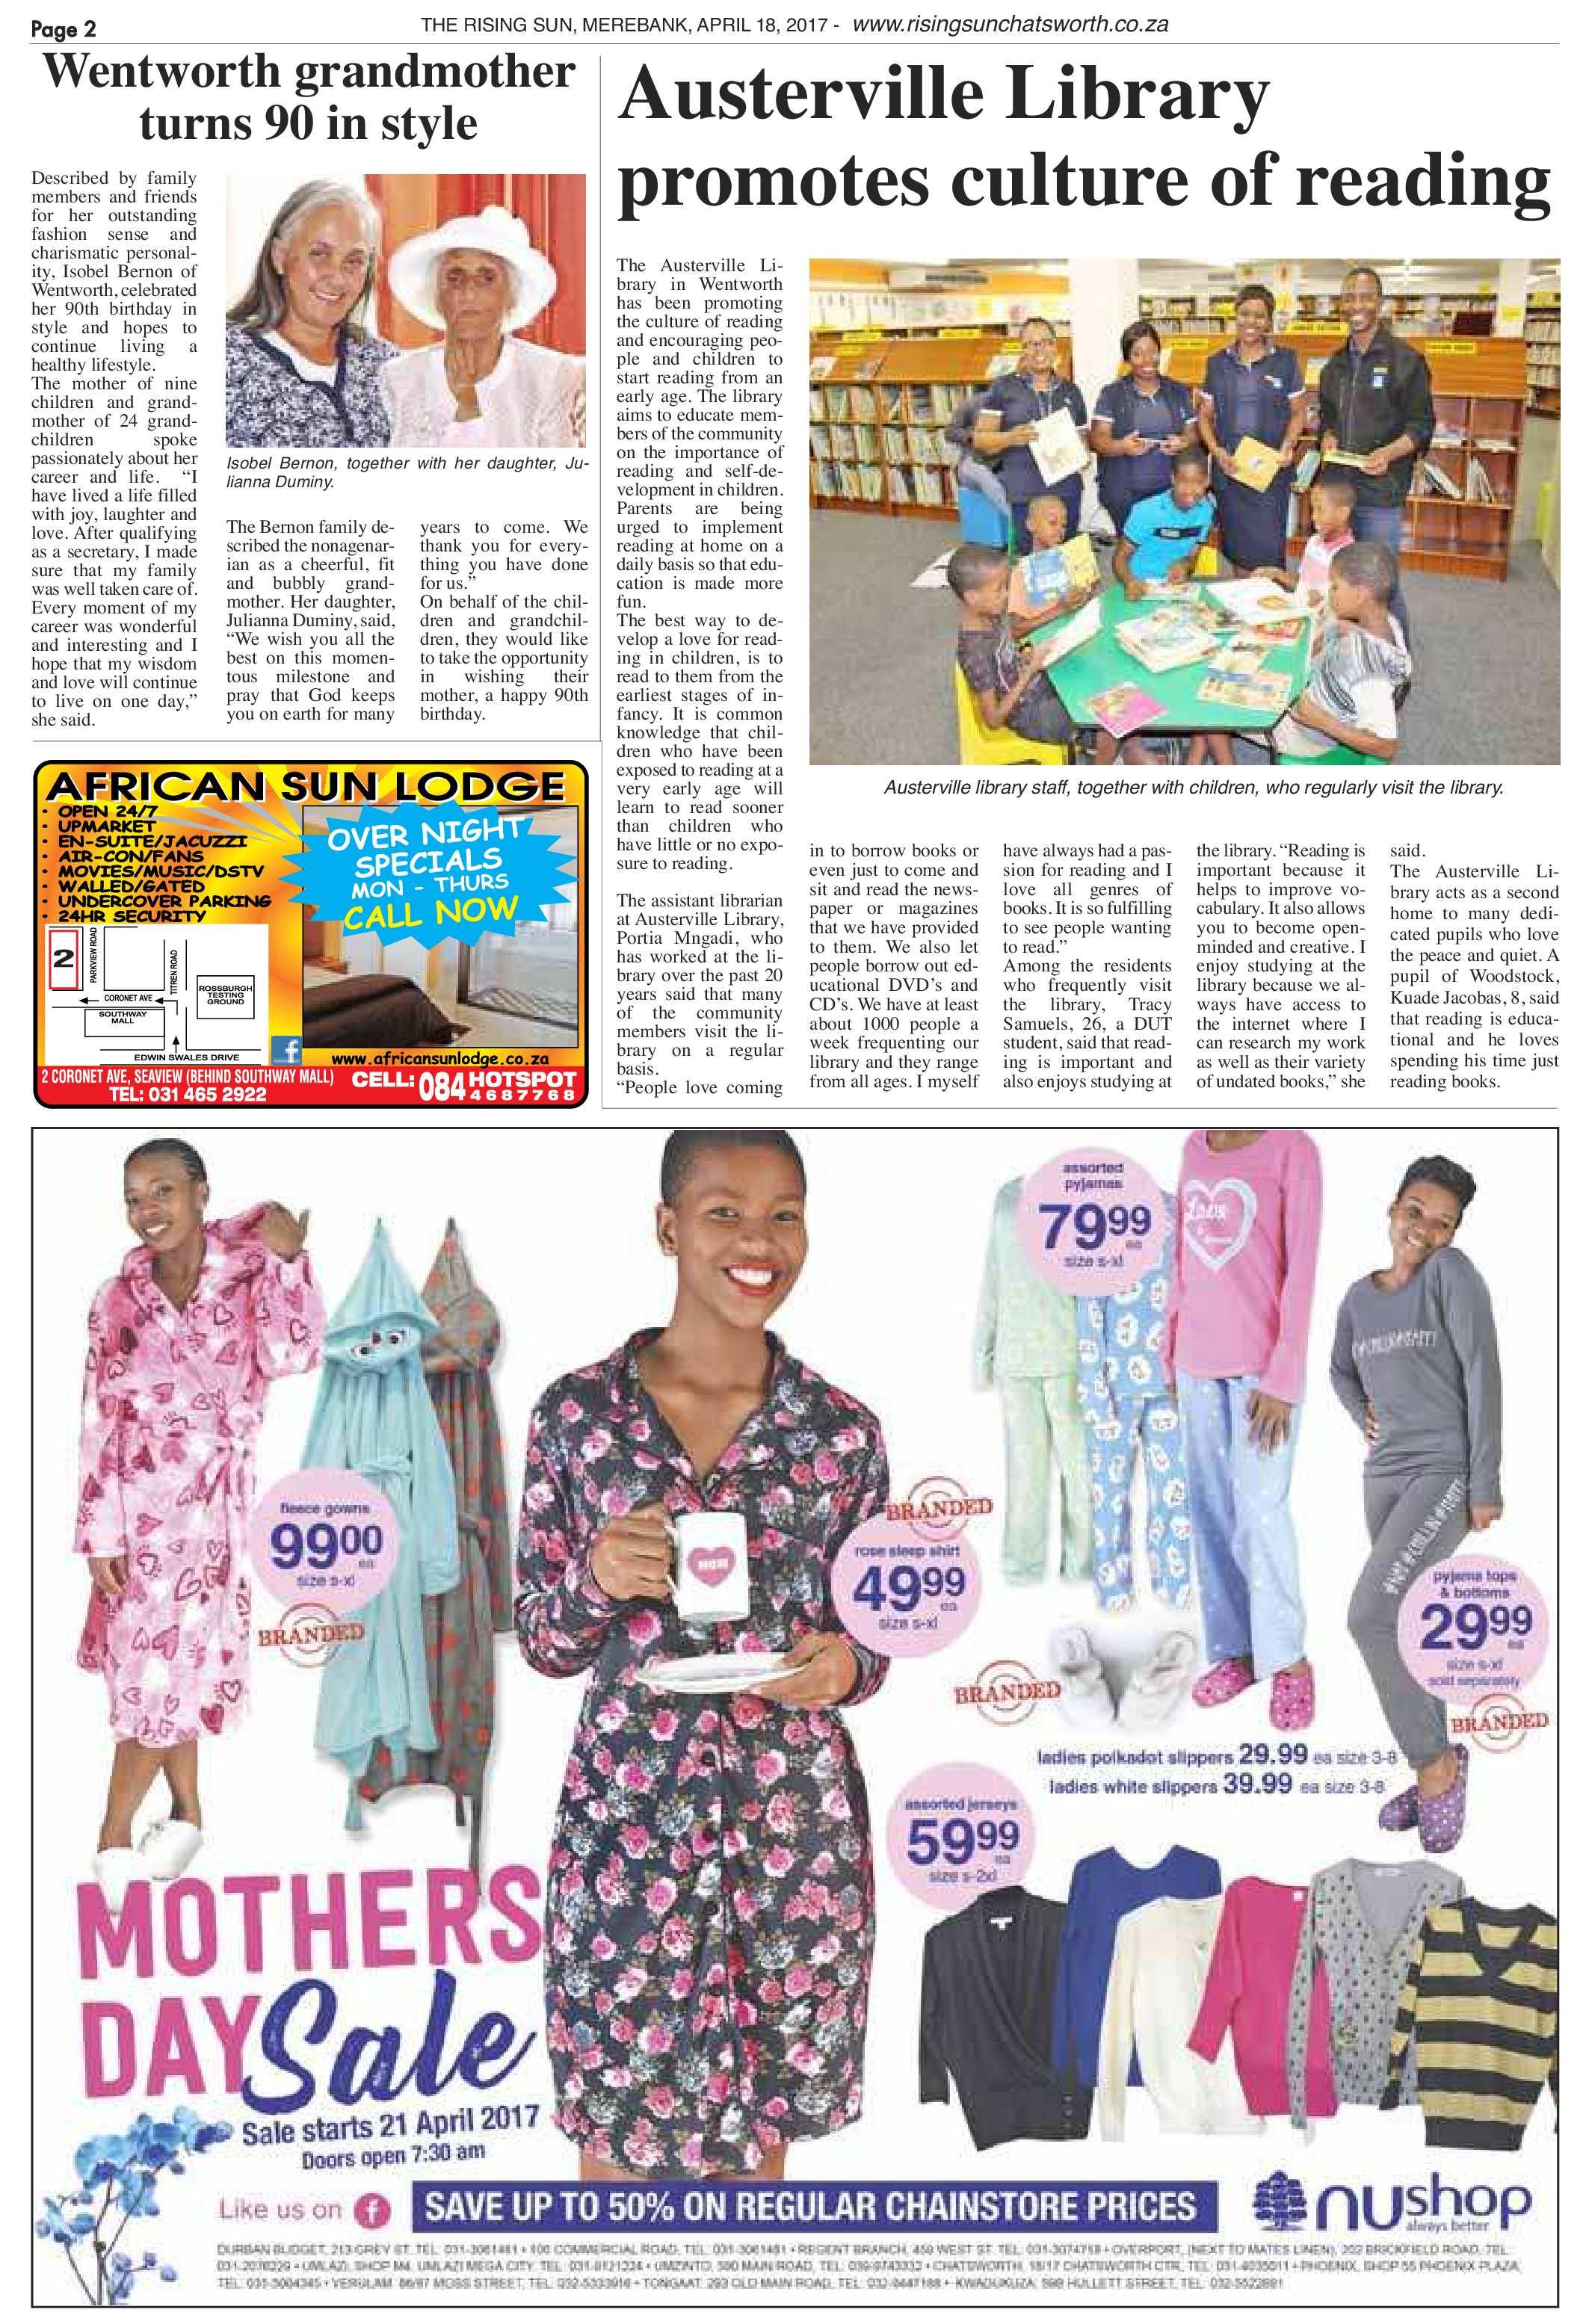 merebank-april-18-epapers-page-2